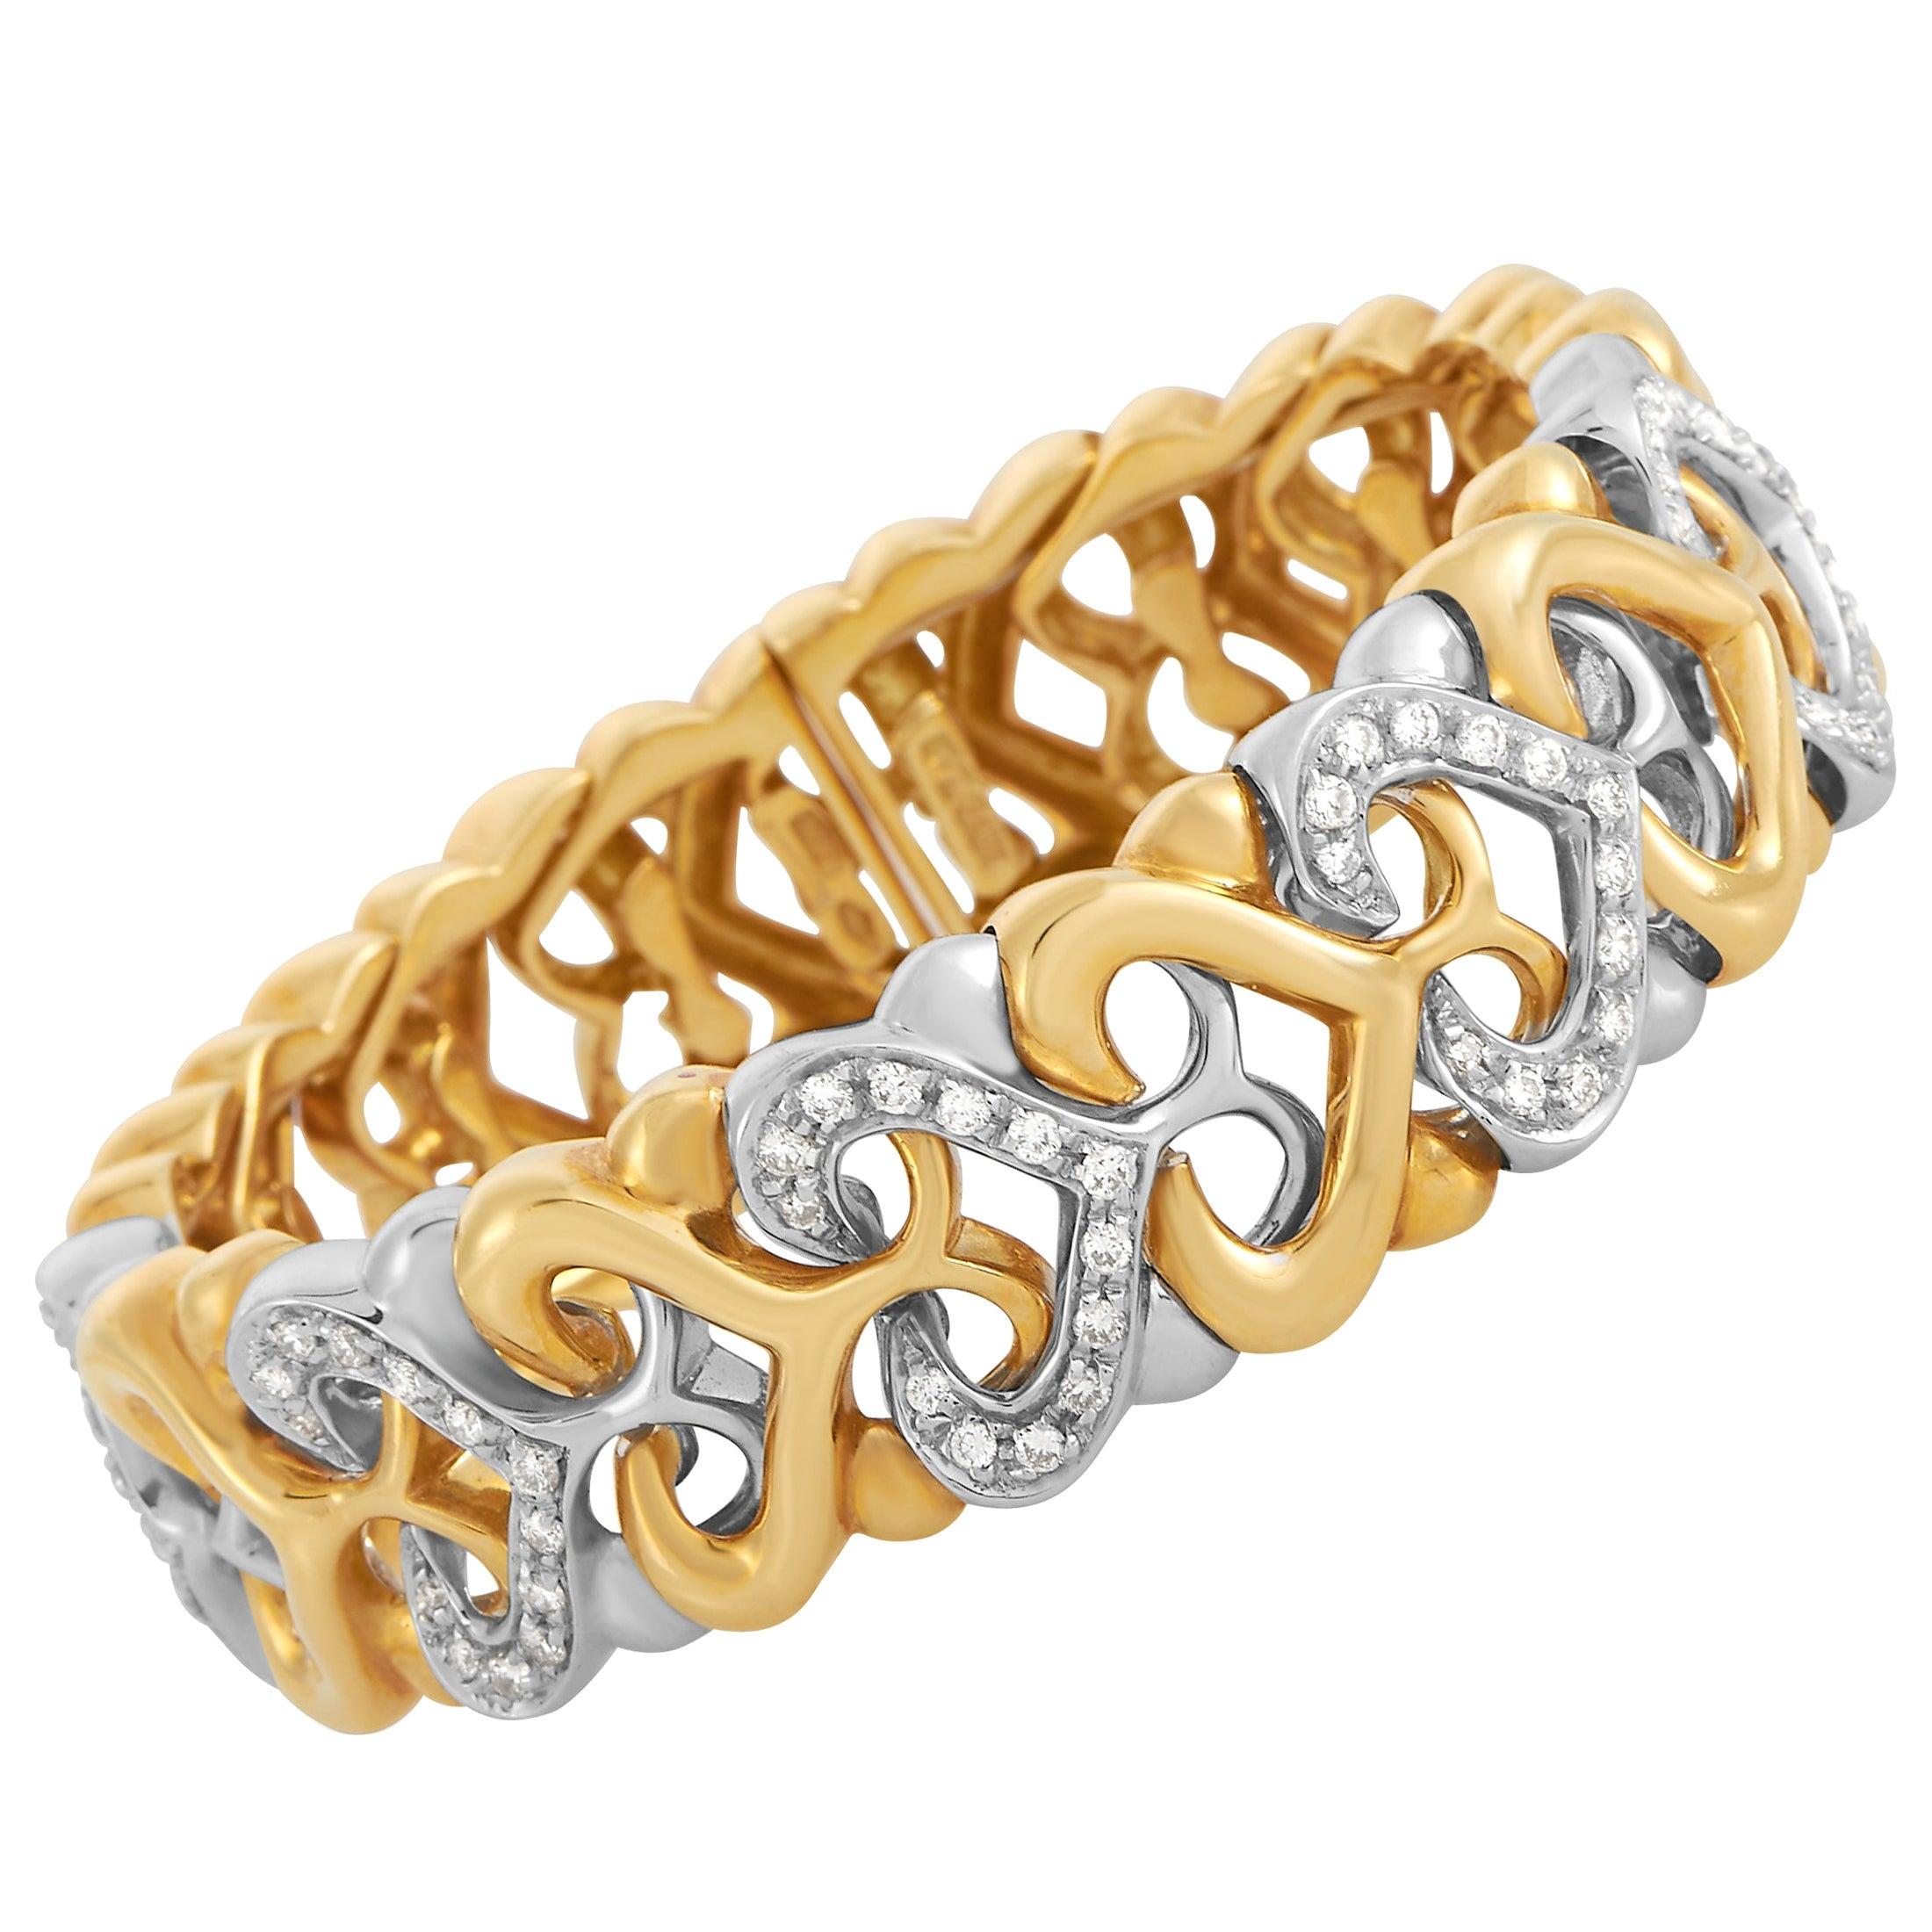 Bvlgari 18K Yellow and White Gold 1.00 Ct Diamond Bracelet